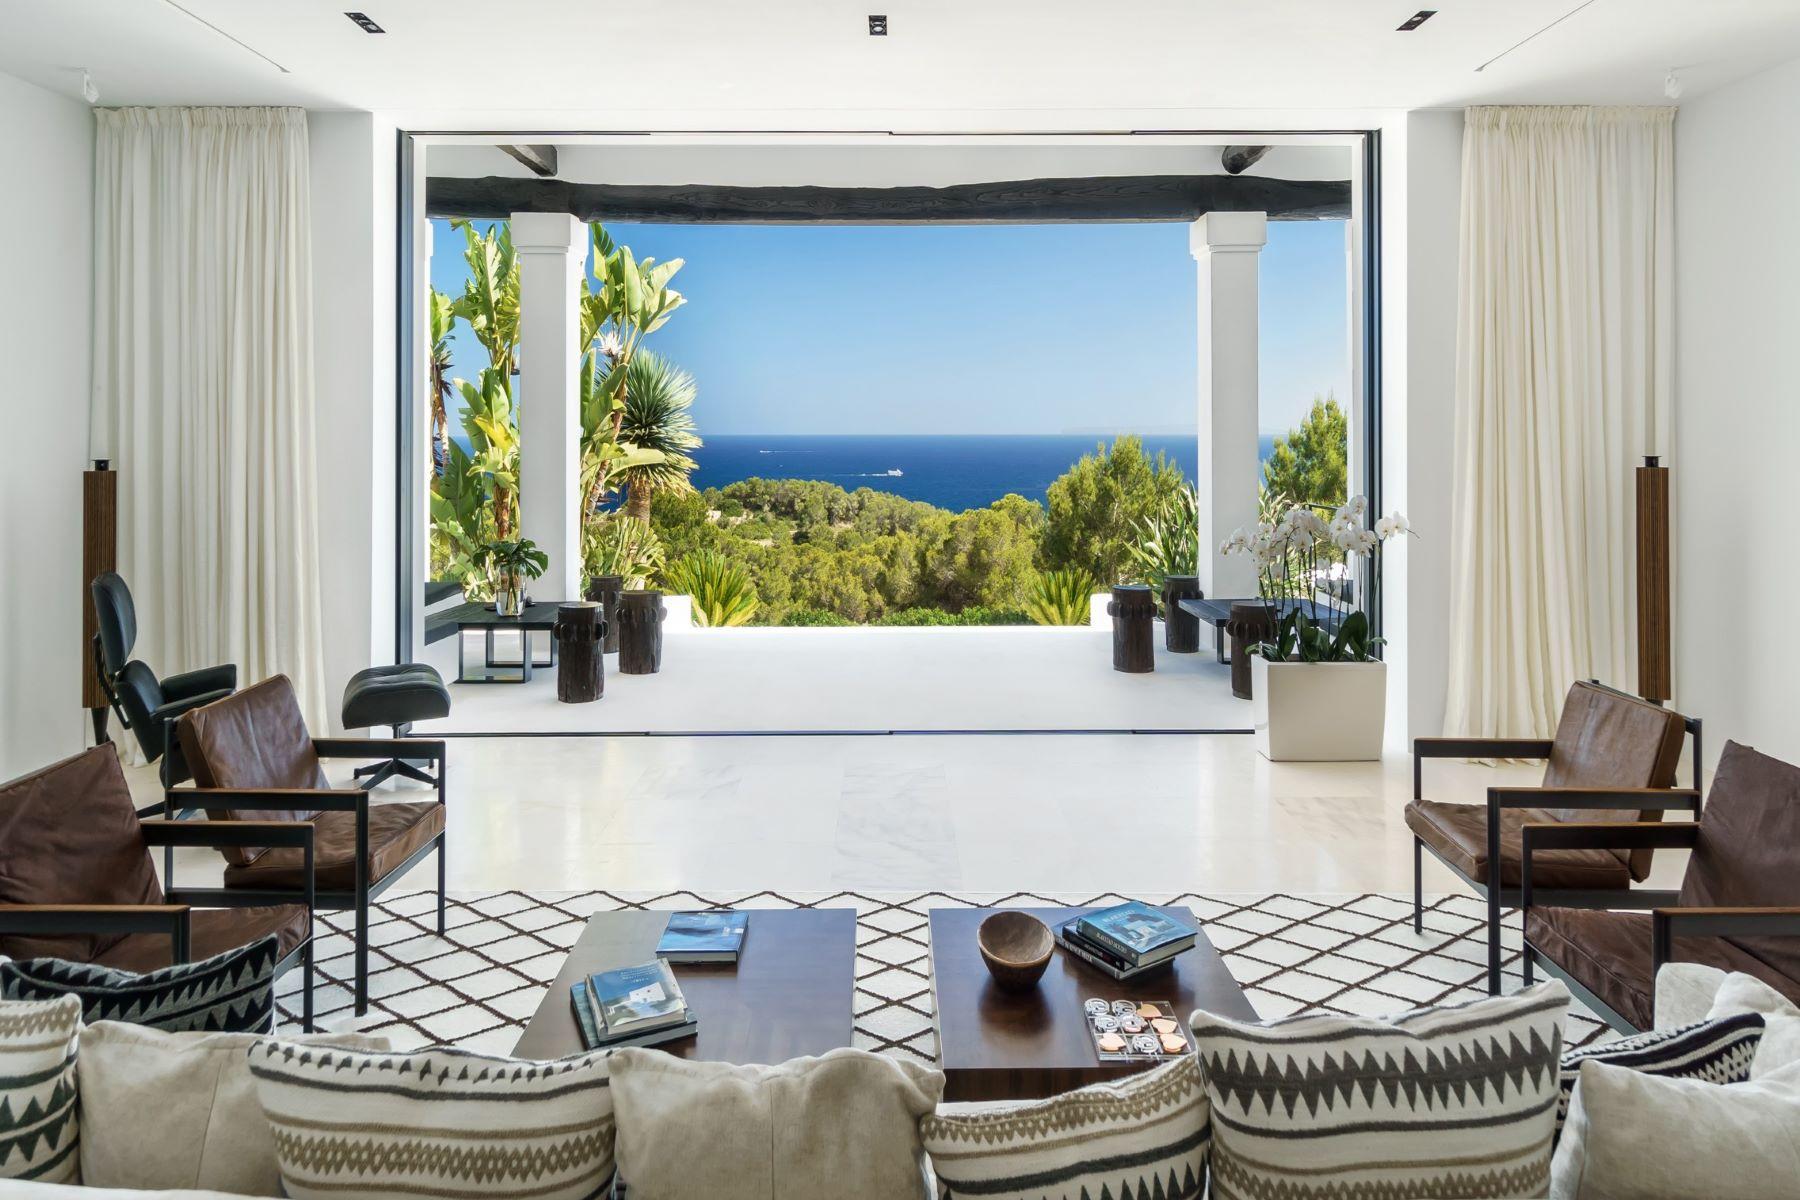 Single Family Home for Rent at Stunning-sea-view-villa-close-to-ibiza-town Ibiza, Ibiza 07800 Spain